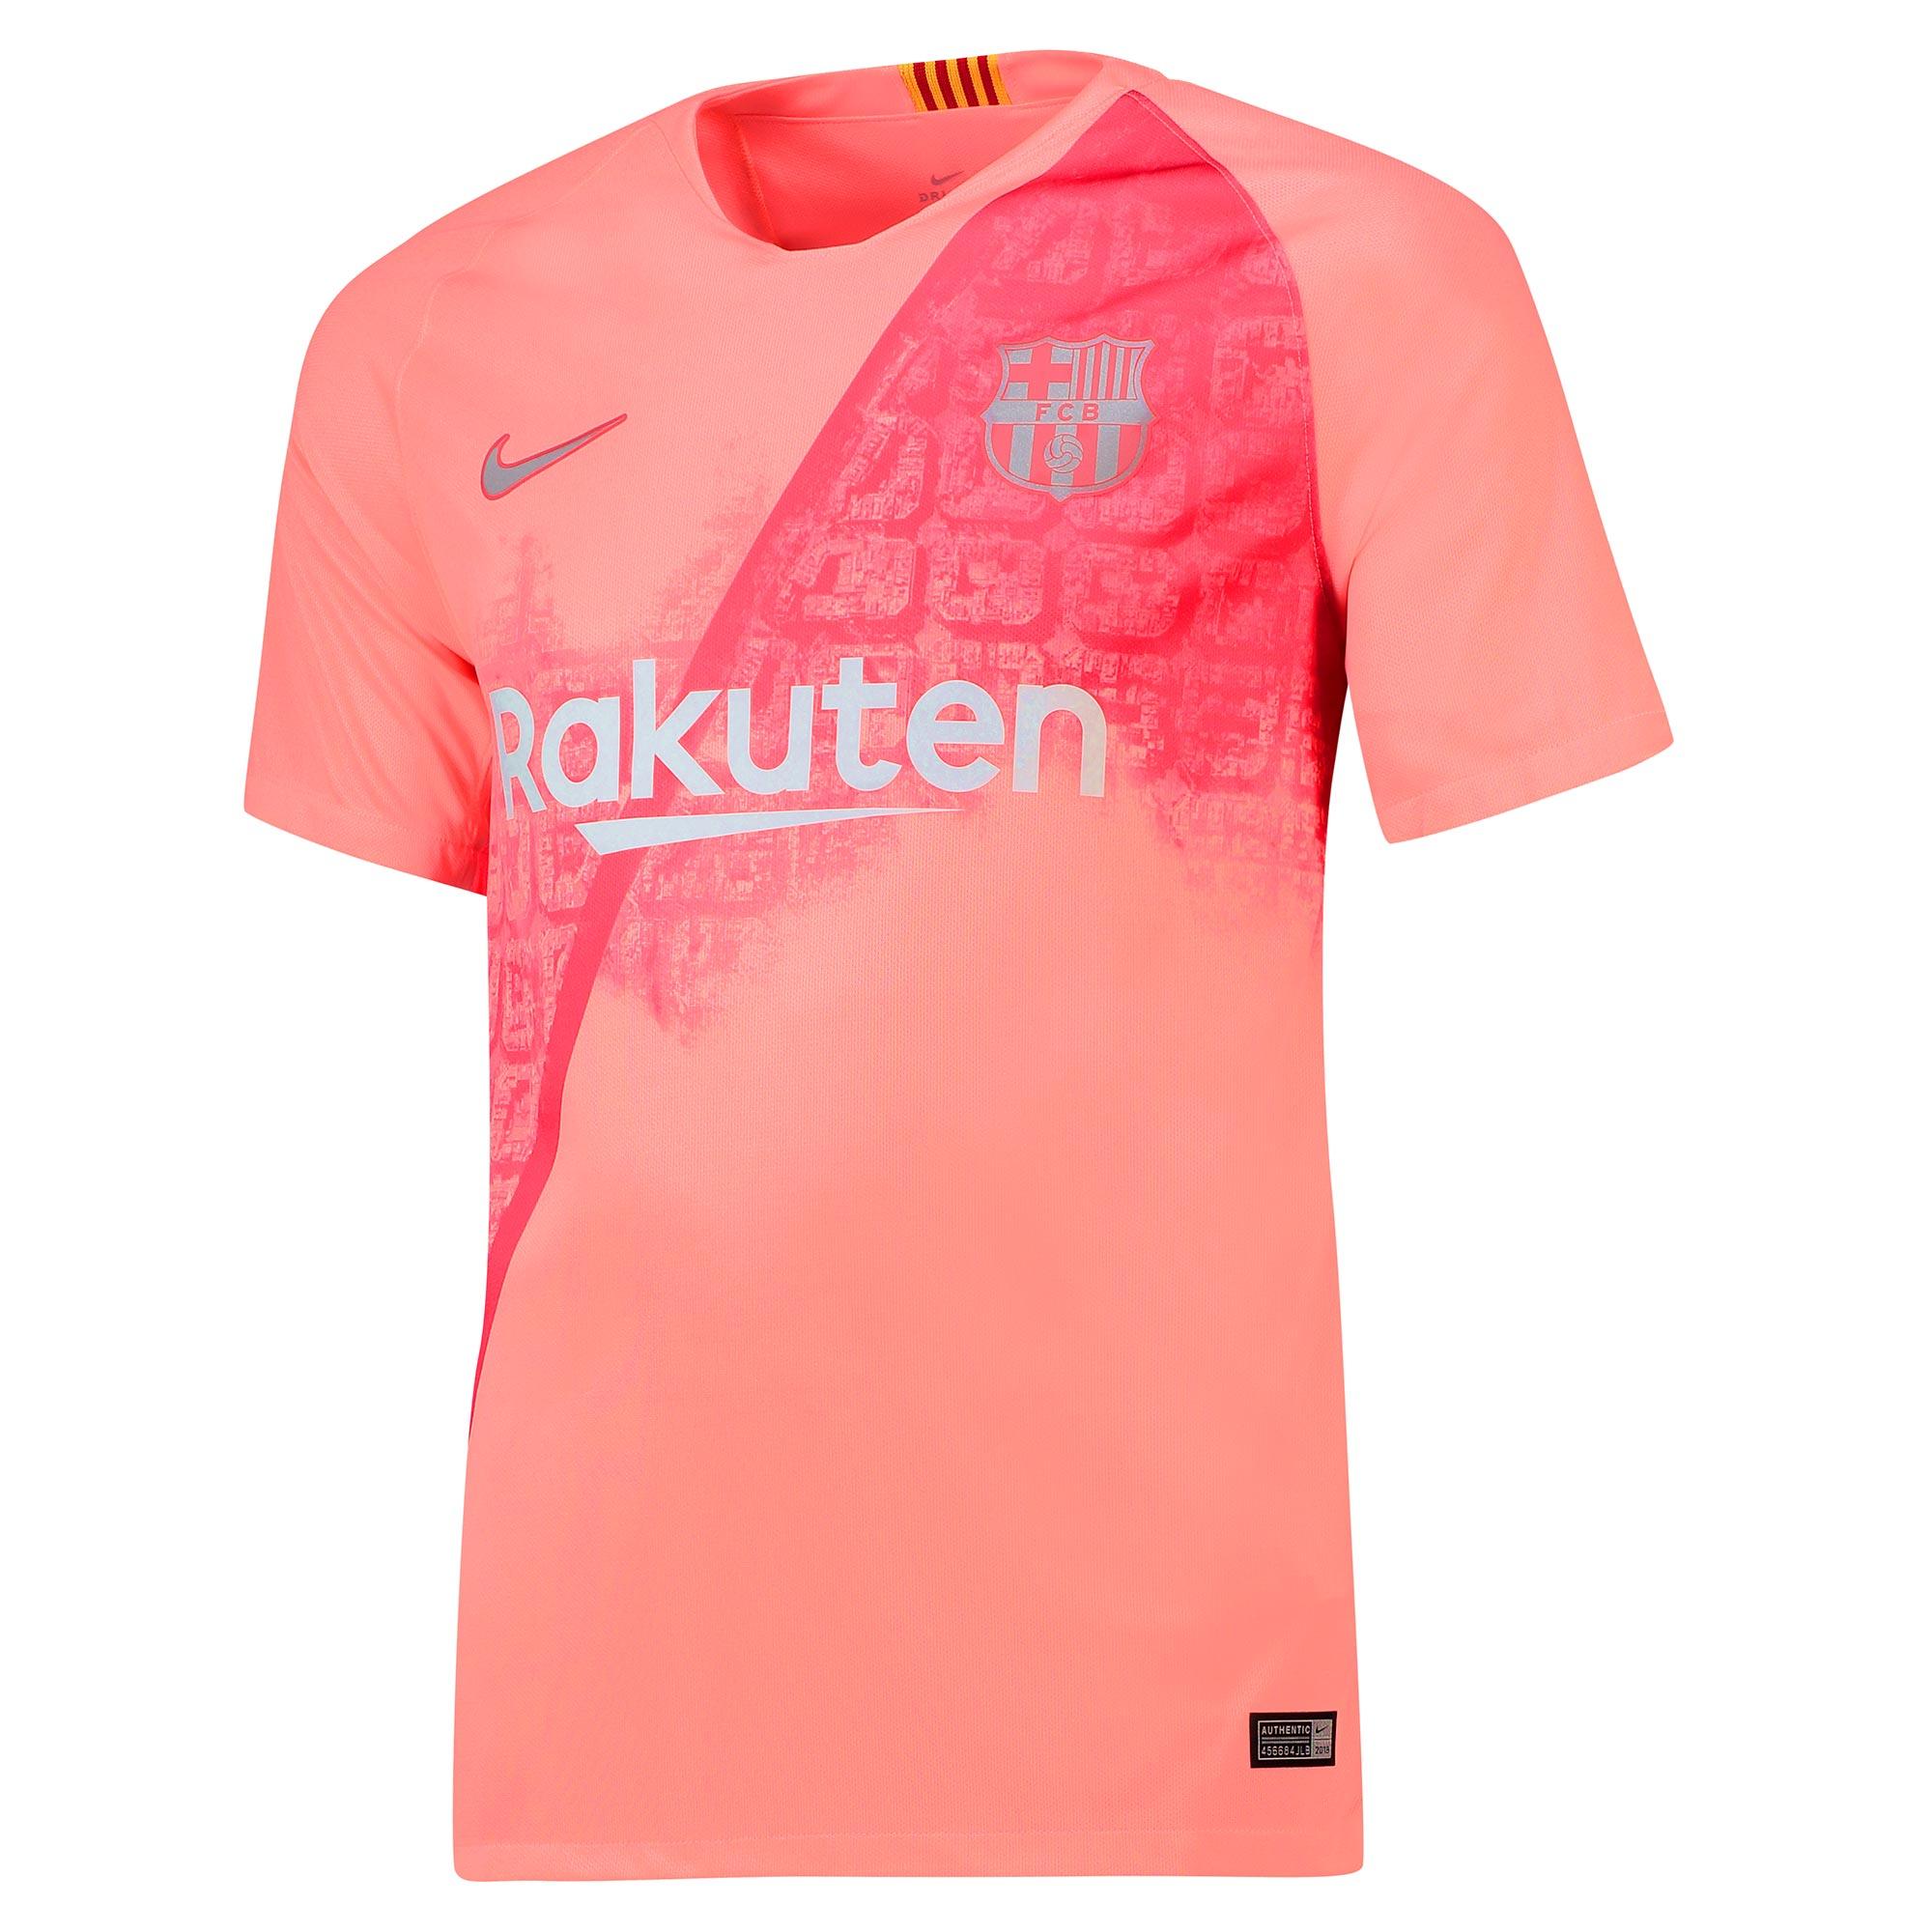 4d3e9d13944 ... Barcelona 2018-19 Nike Away Kit · Click to enlarge image  barcelona 18 19 nike third kit a.jpg ...